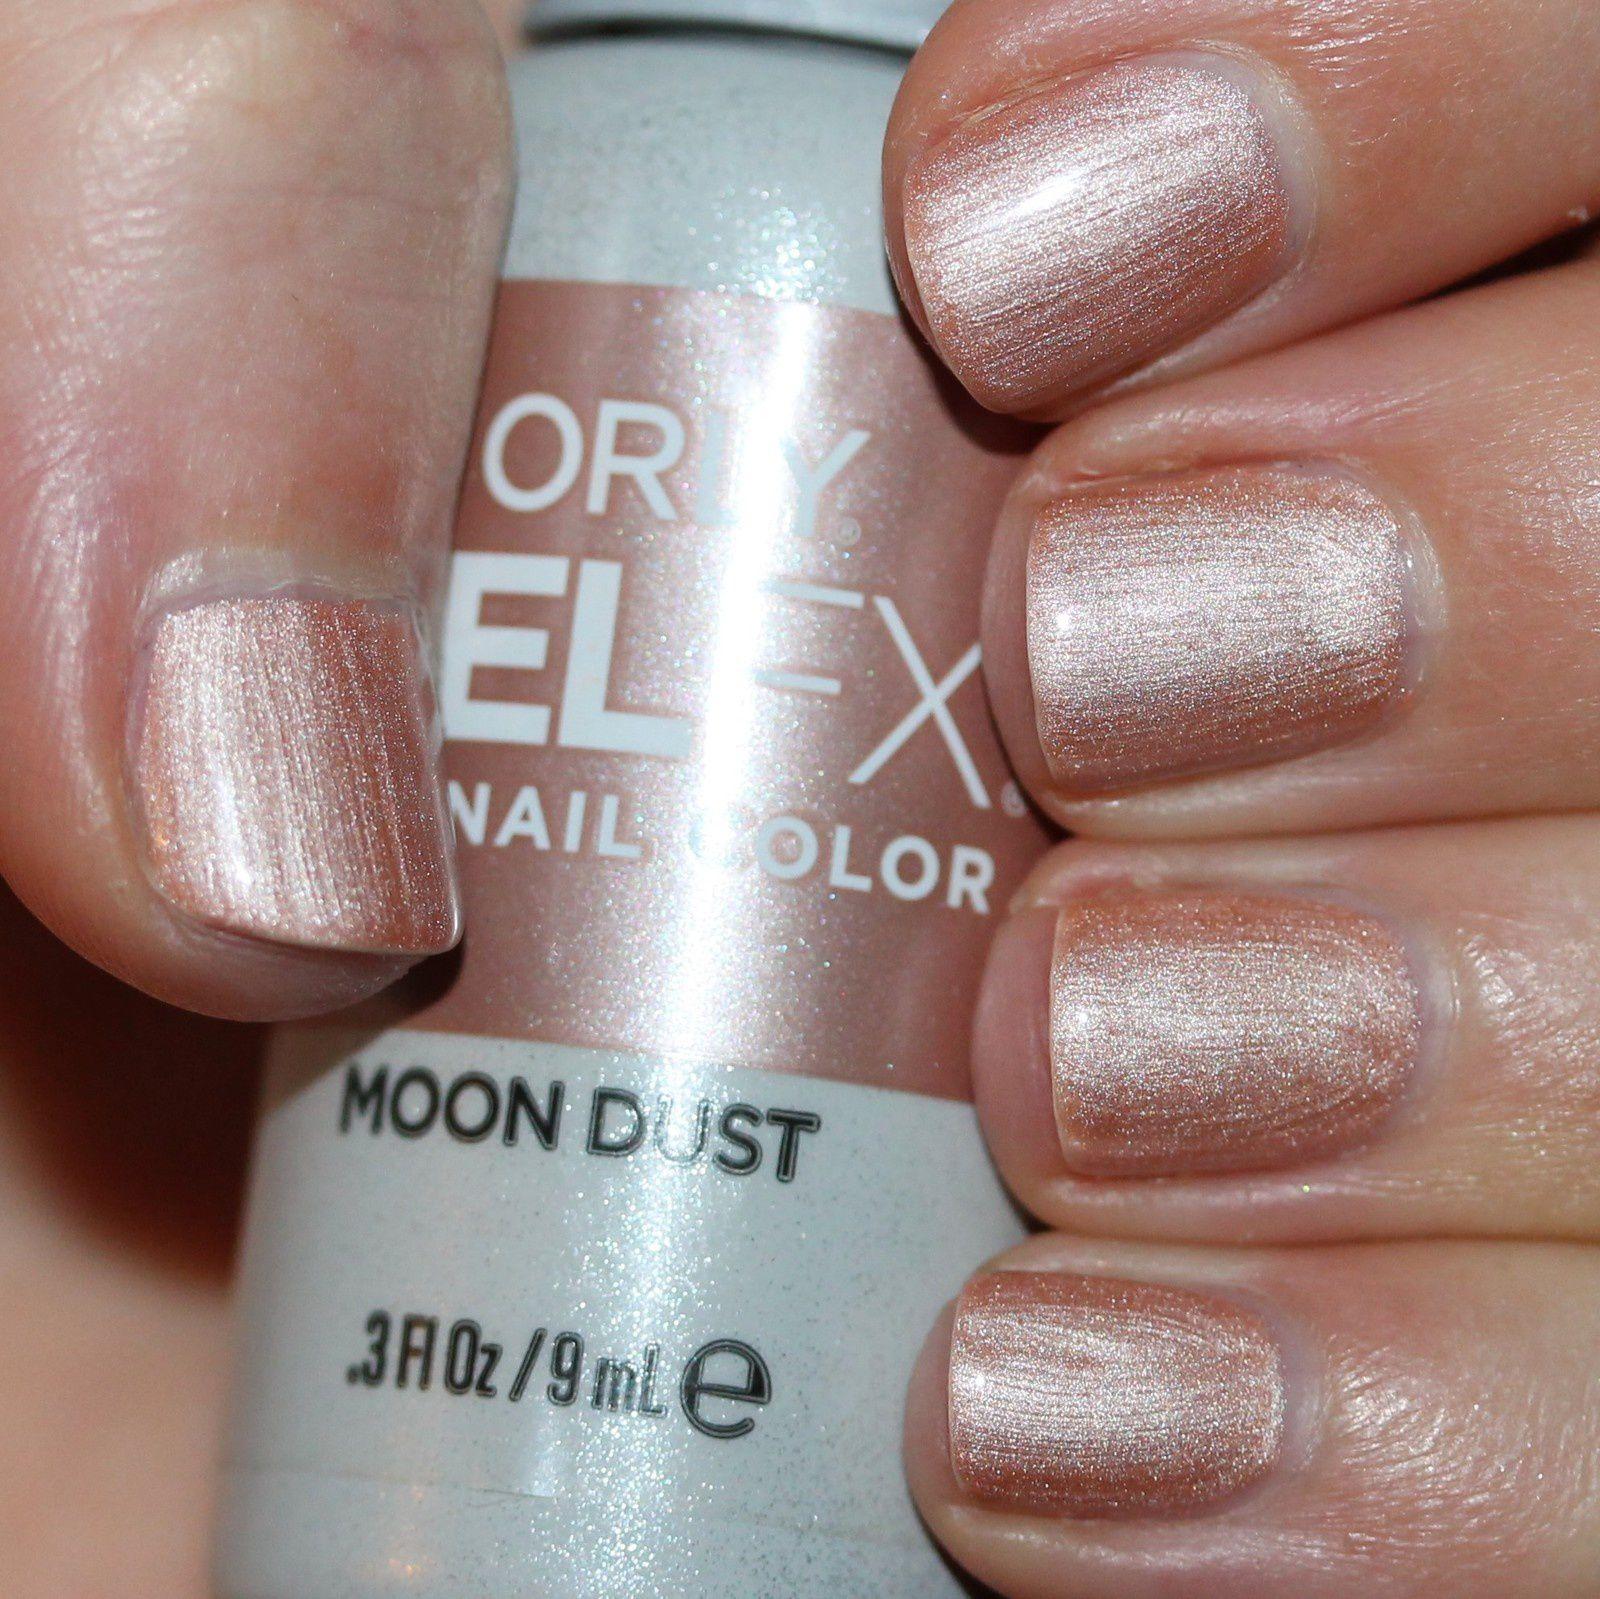 Gelish pH Bond Nail Prep / Gelish Foundation Soak Off Gel Base / Orly Gel FX Moon Dust / Gelish Top it off Soak Off Gel Sealer